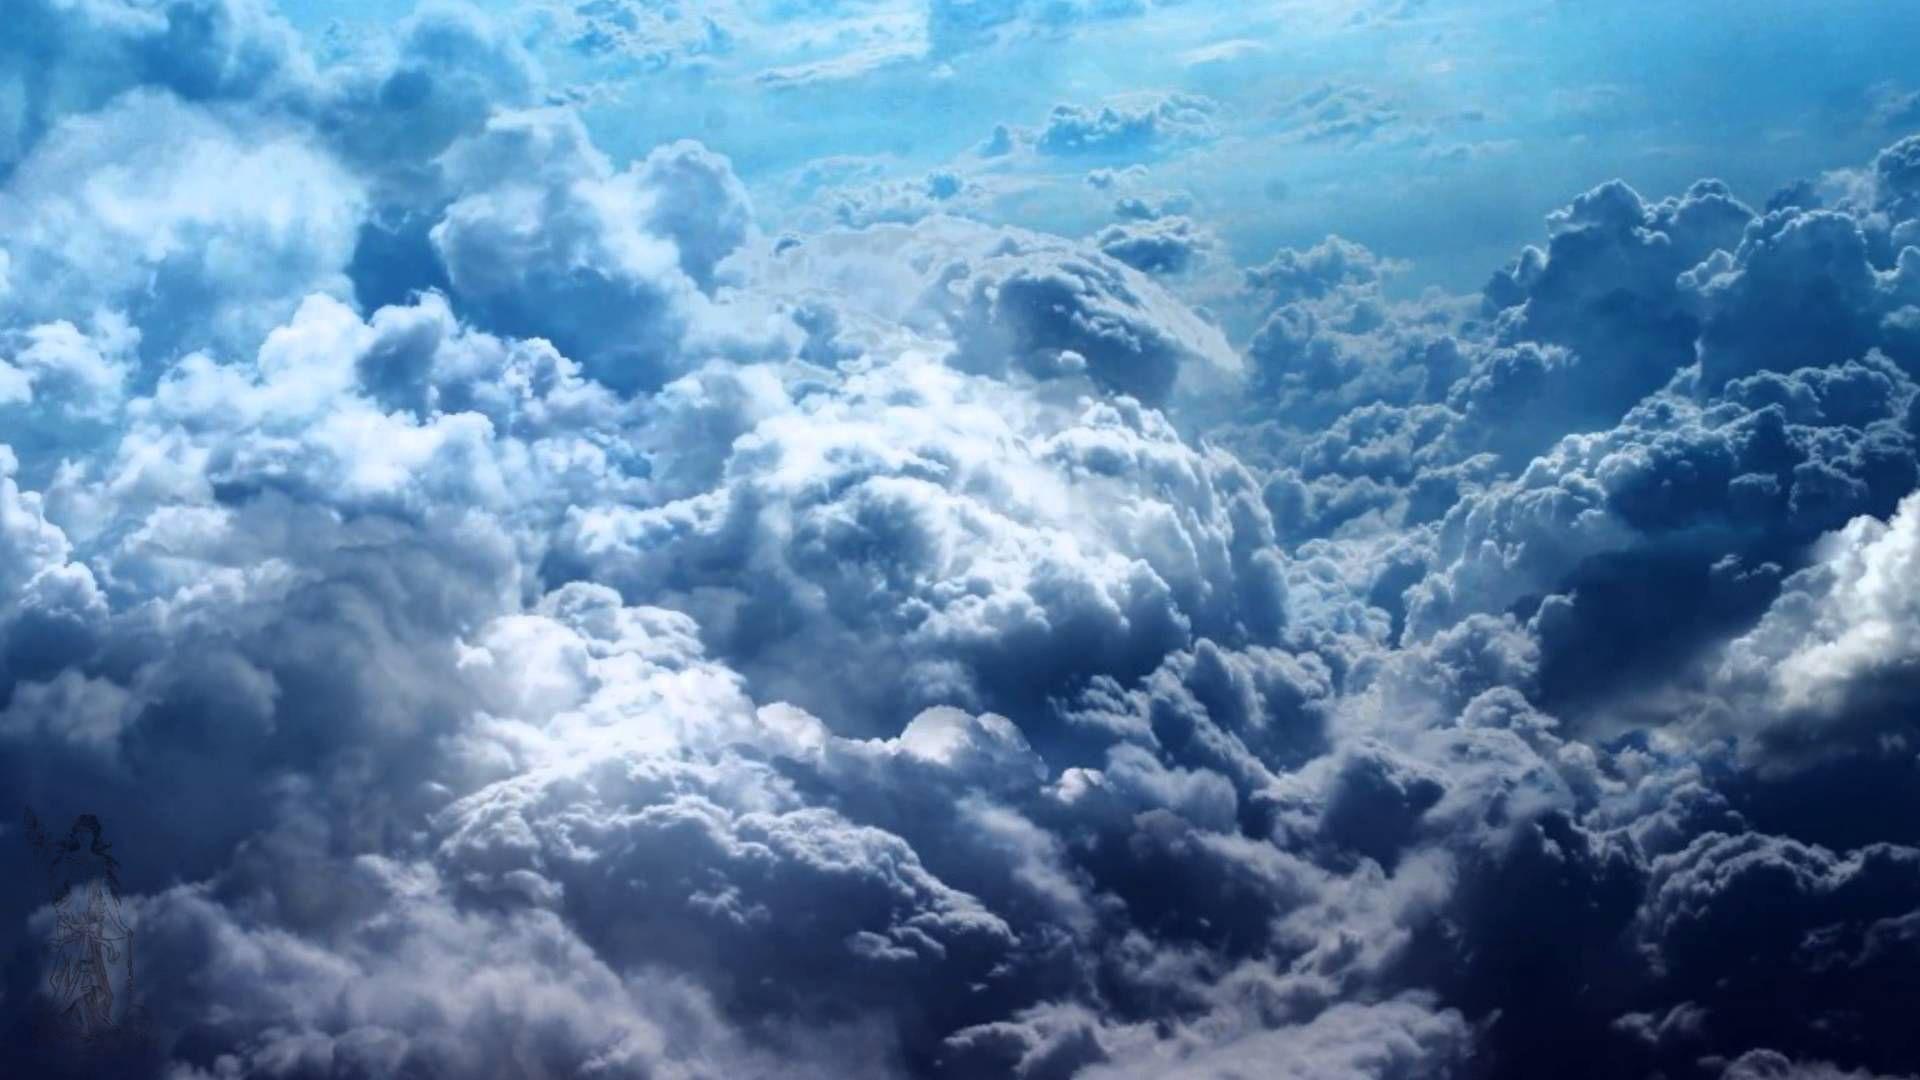 Dark Clouds free image